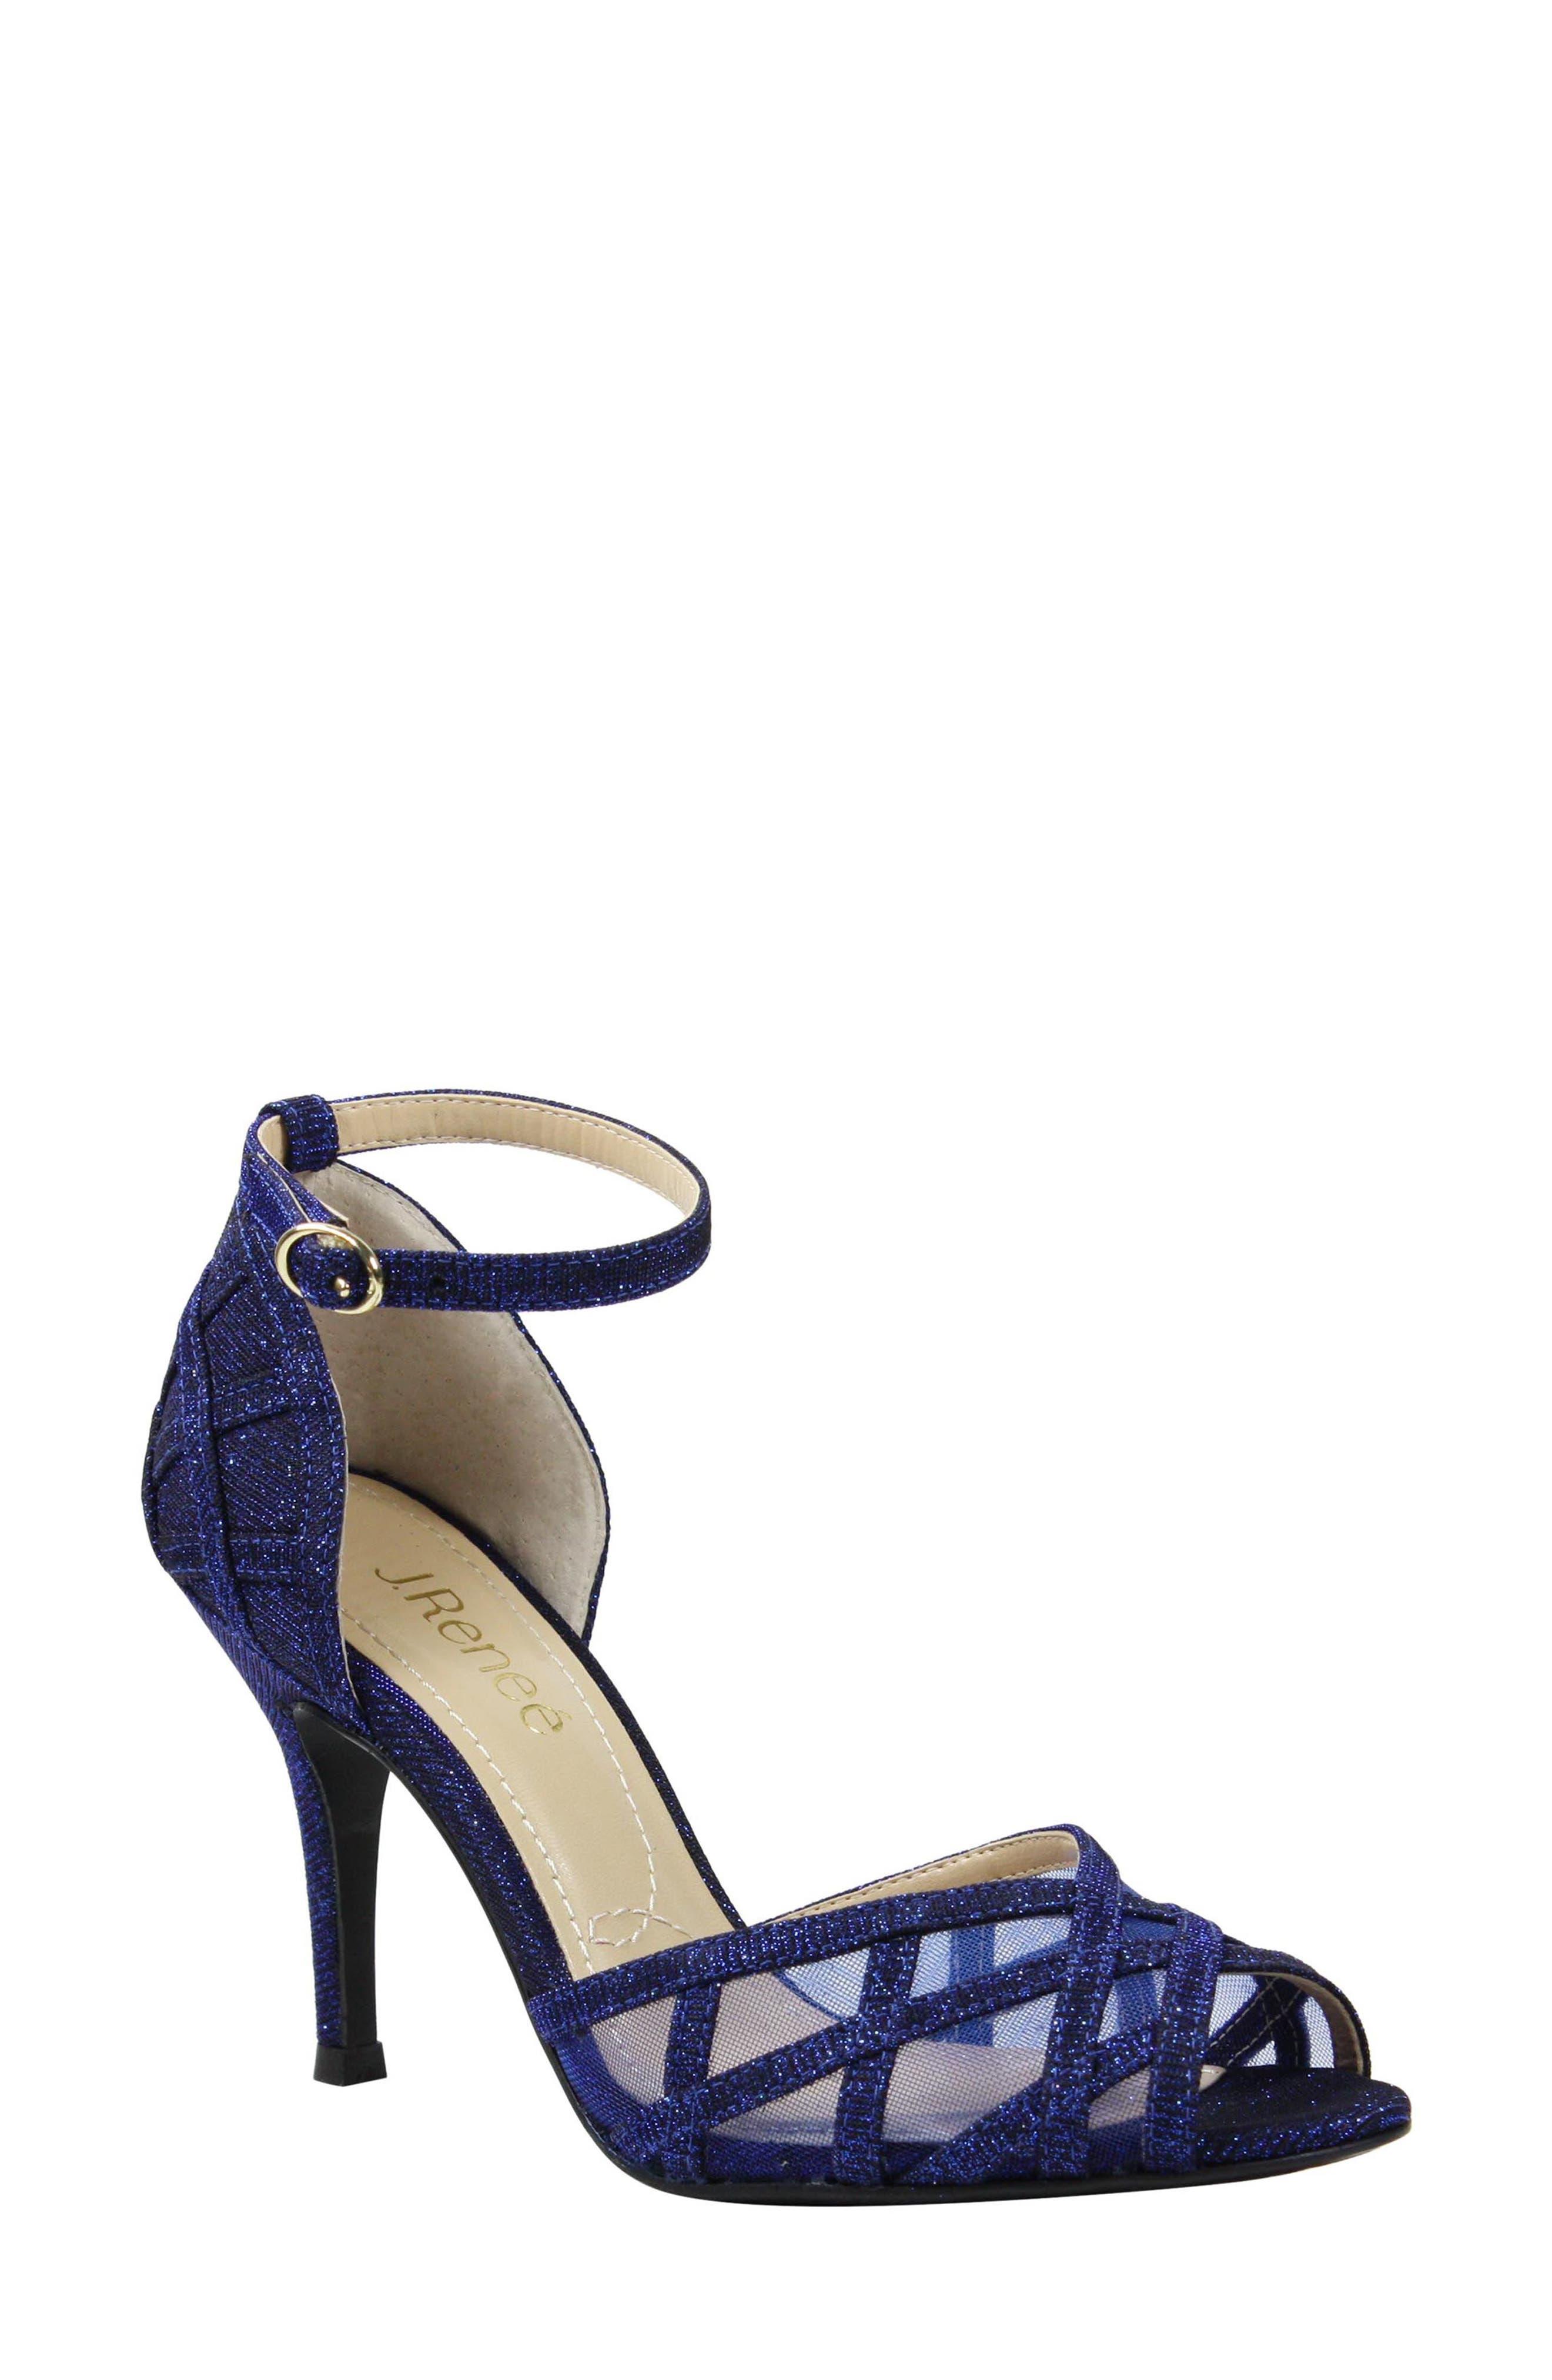 Alternate Image 1 Selected - J. Reneé Mataro Embellished Ankle Strap Pump (Women)